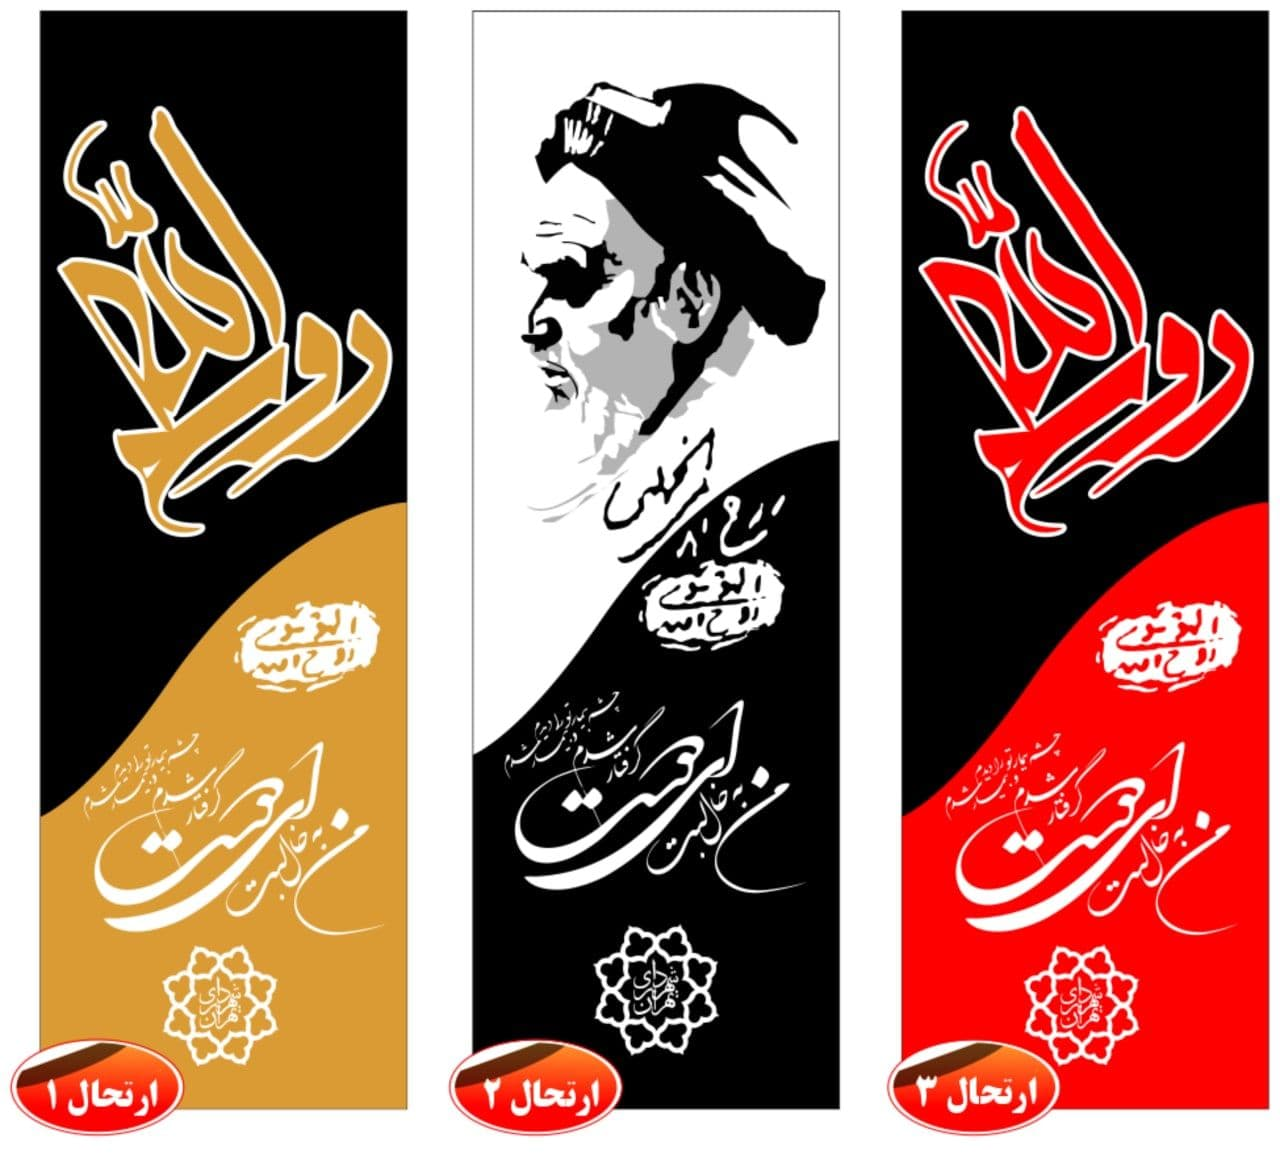 نمونه پرچم ارتحال امام